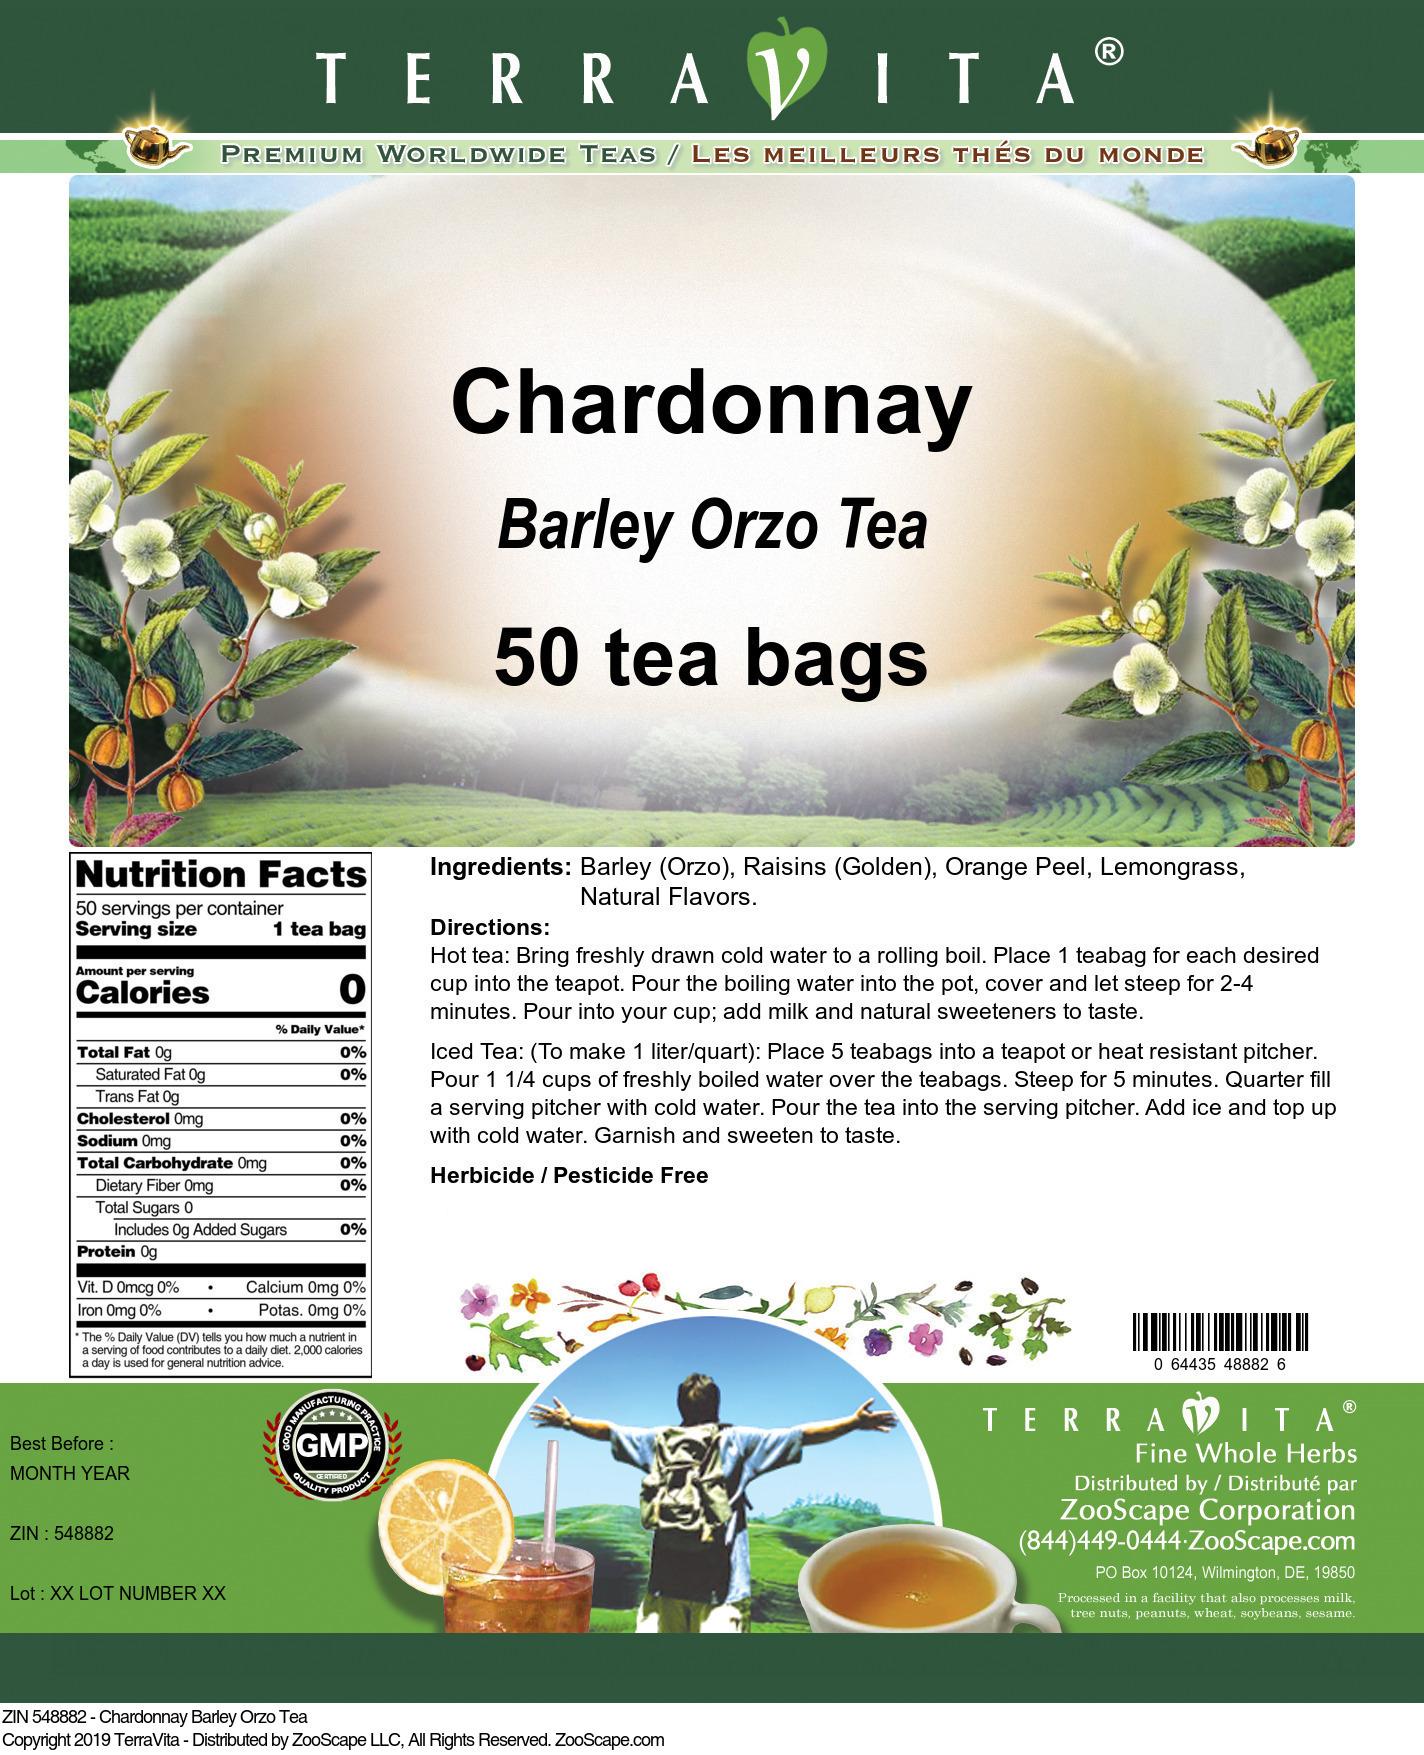 Chardonnay Barley Orzo Tea